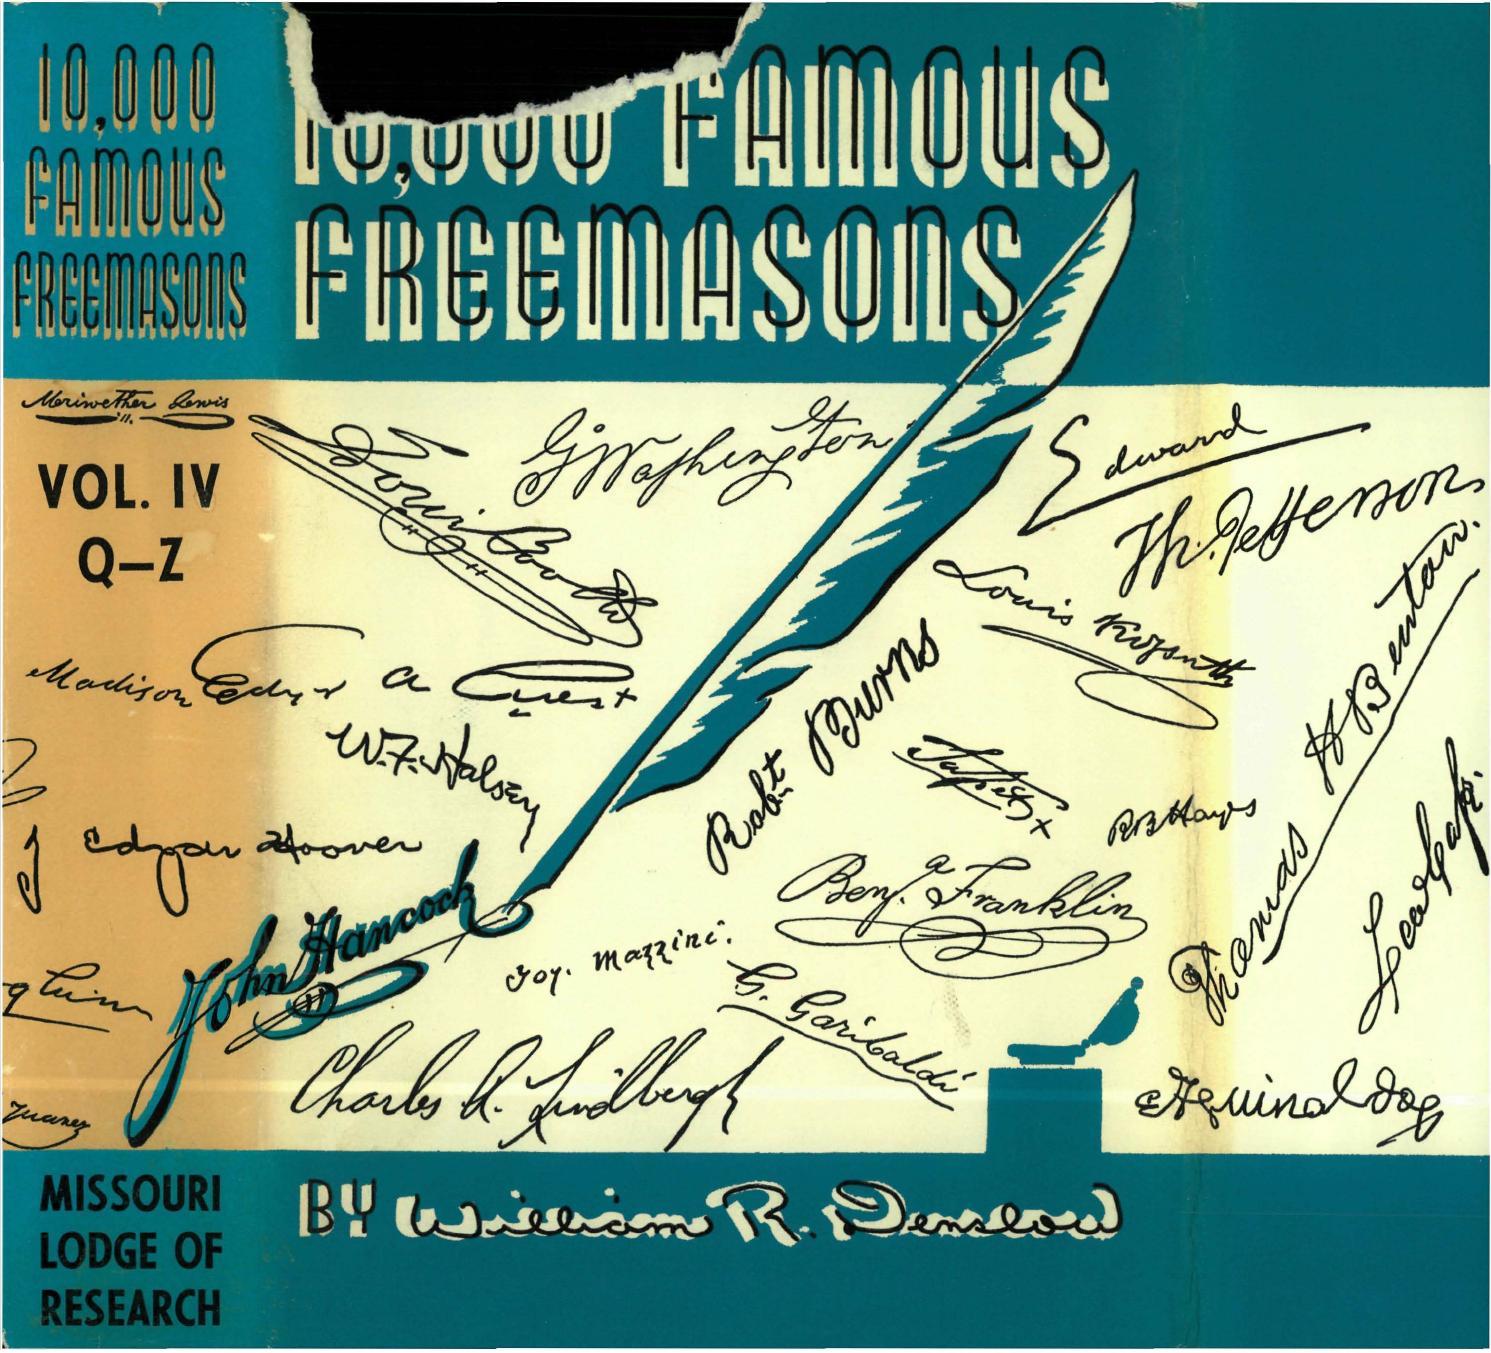 images about Masonic on Pinterest   Facebook  Knights     Wikipedia The Oklahoma Masonic Indian Degree Team